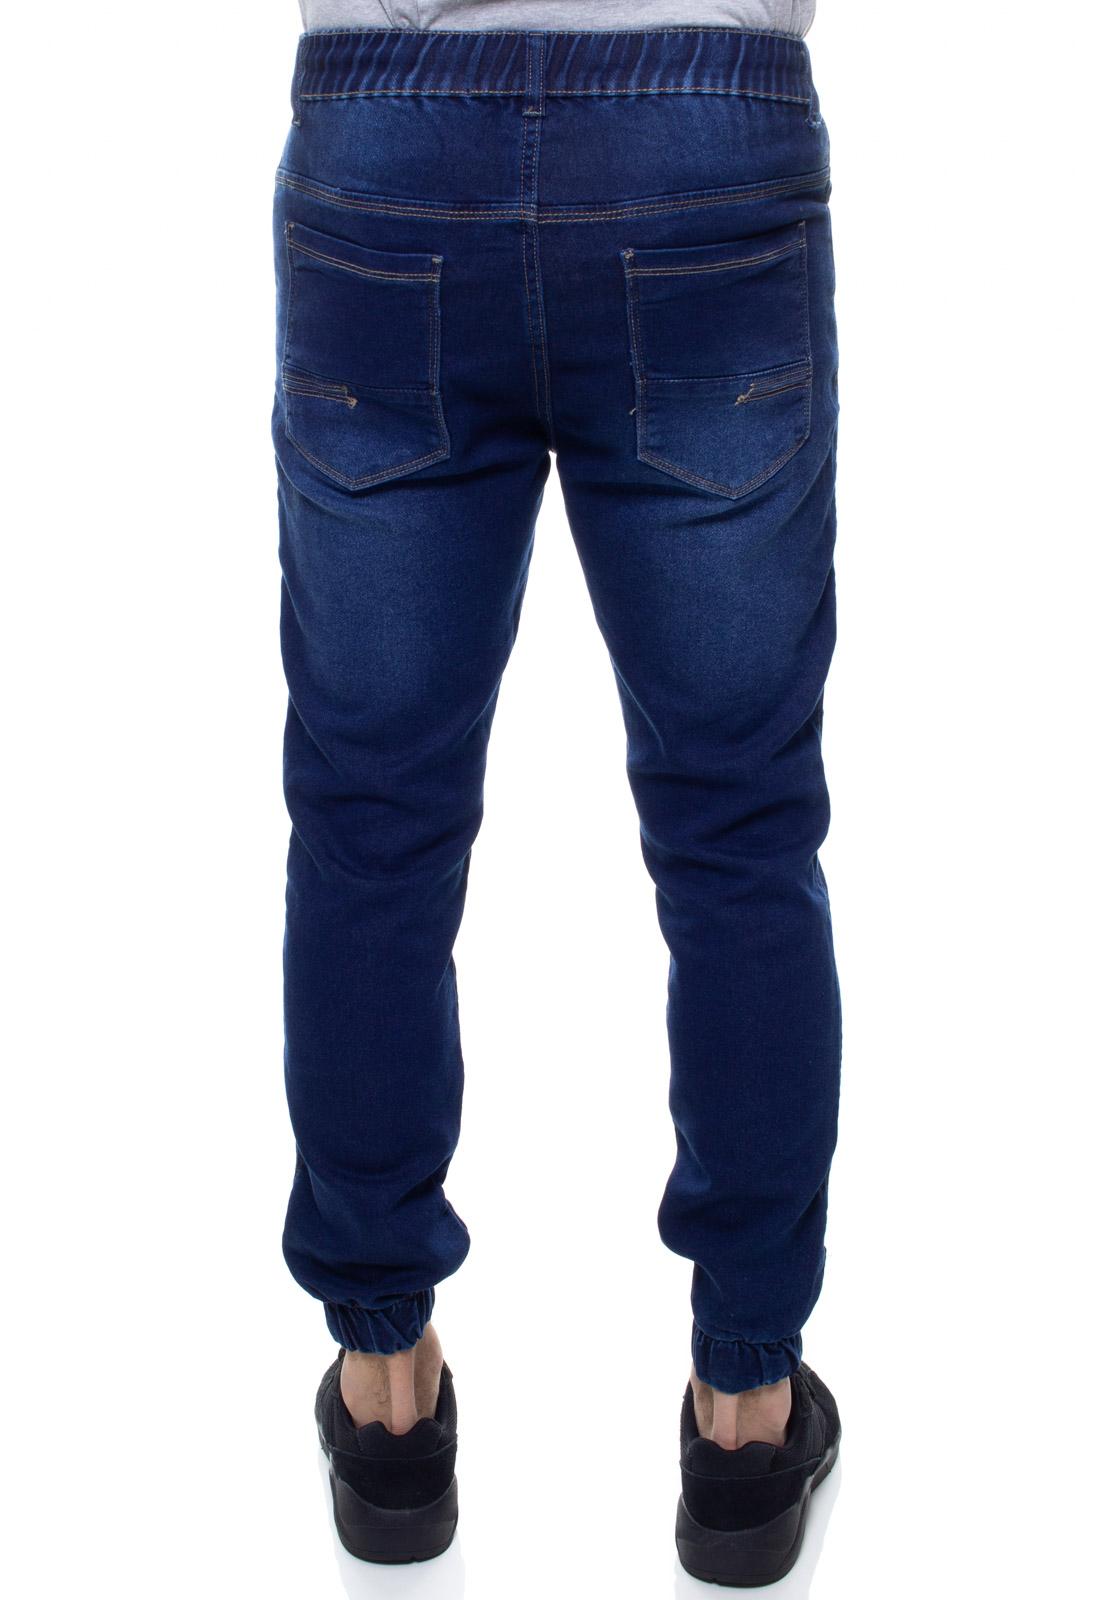 Calça Jogger Jeans Masculina Crocker - 47987  - CROCKER JEANS